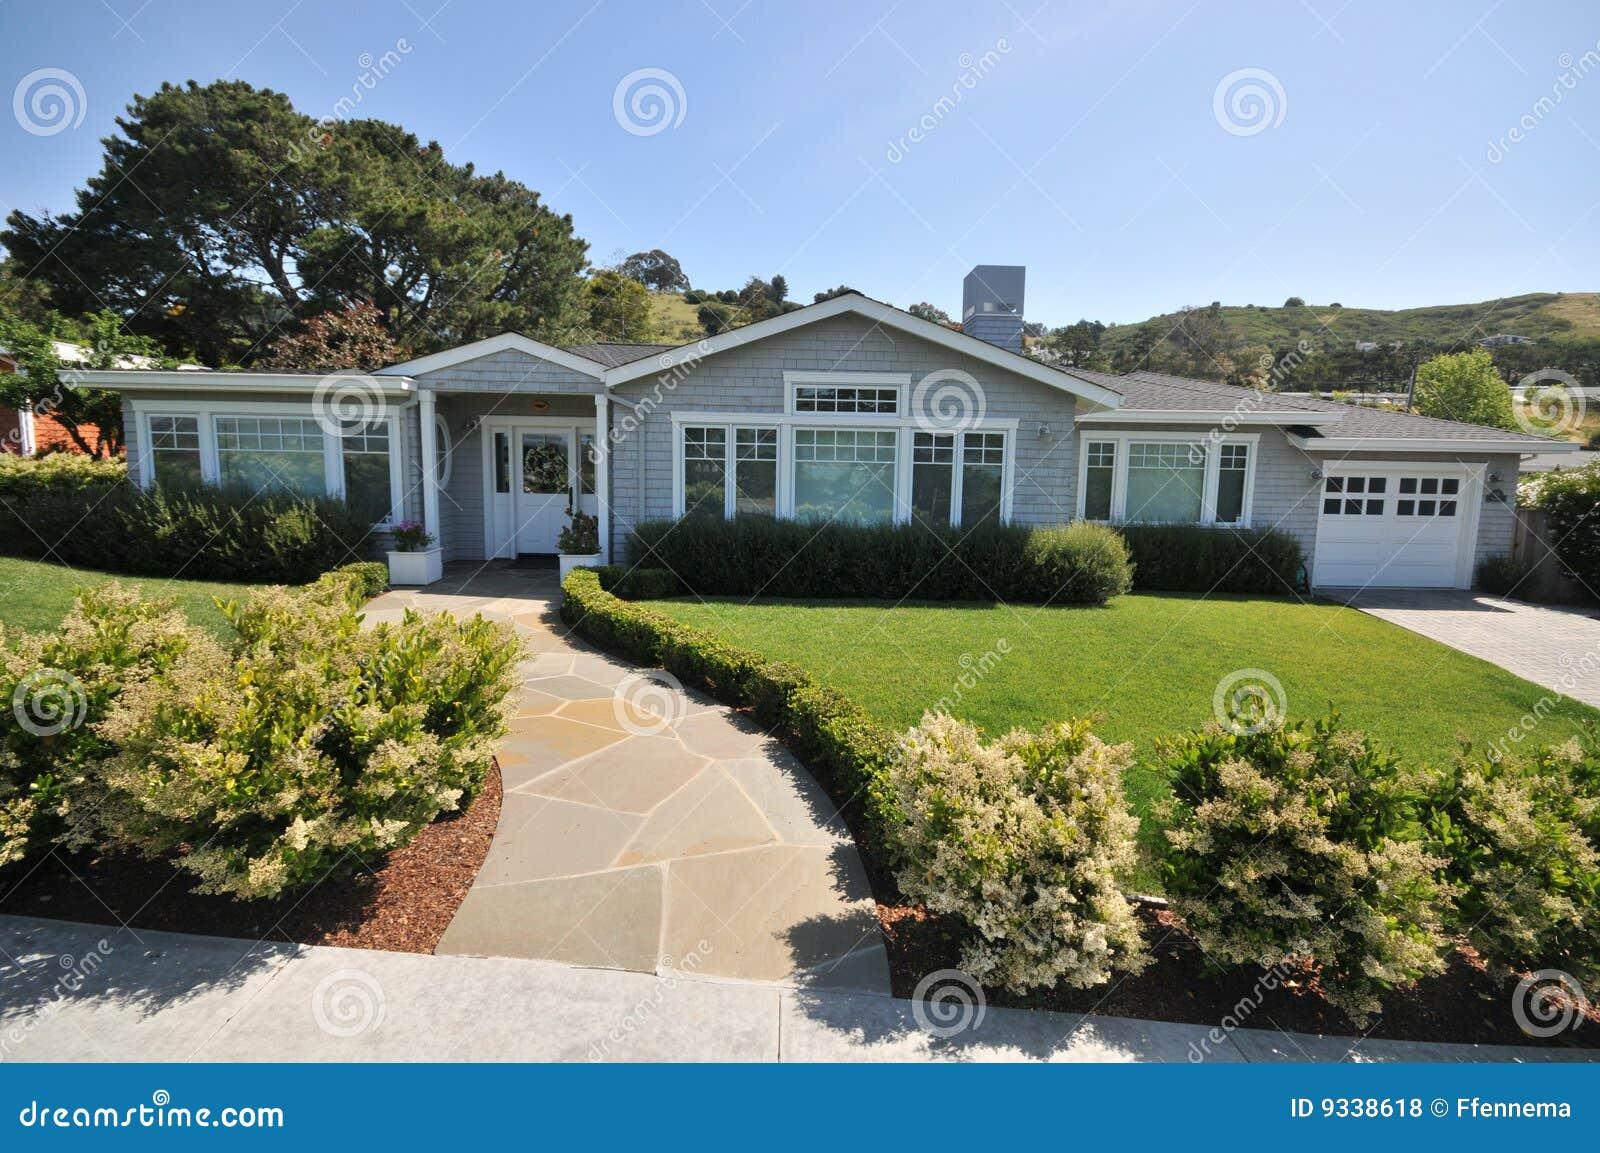 House With Tile Walkway To Front Door Stock Photo Image